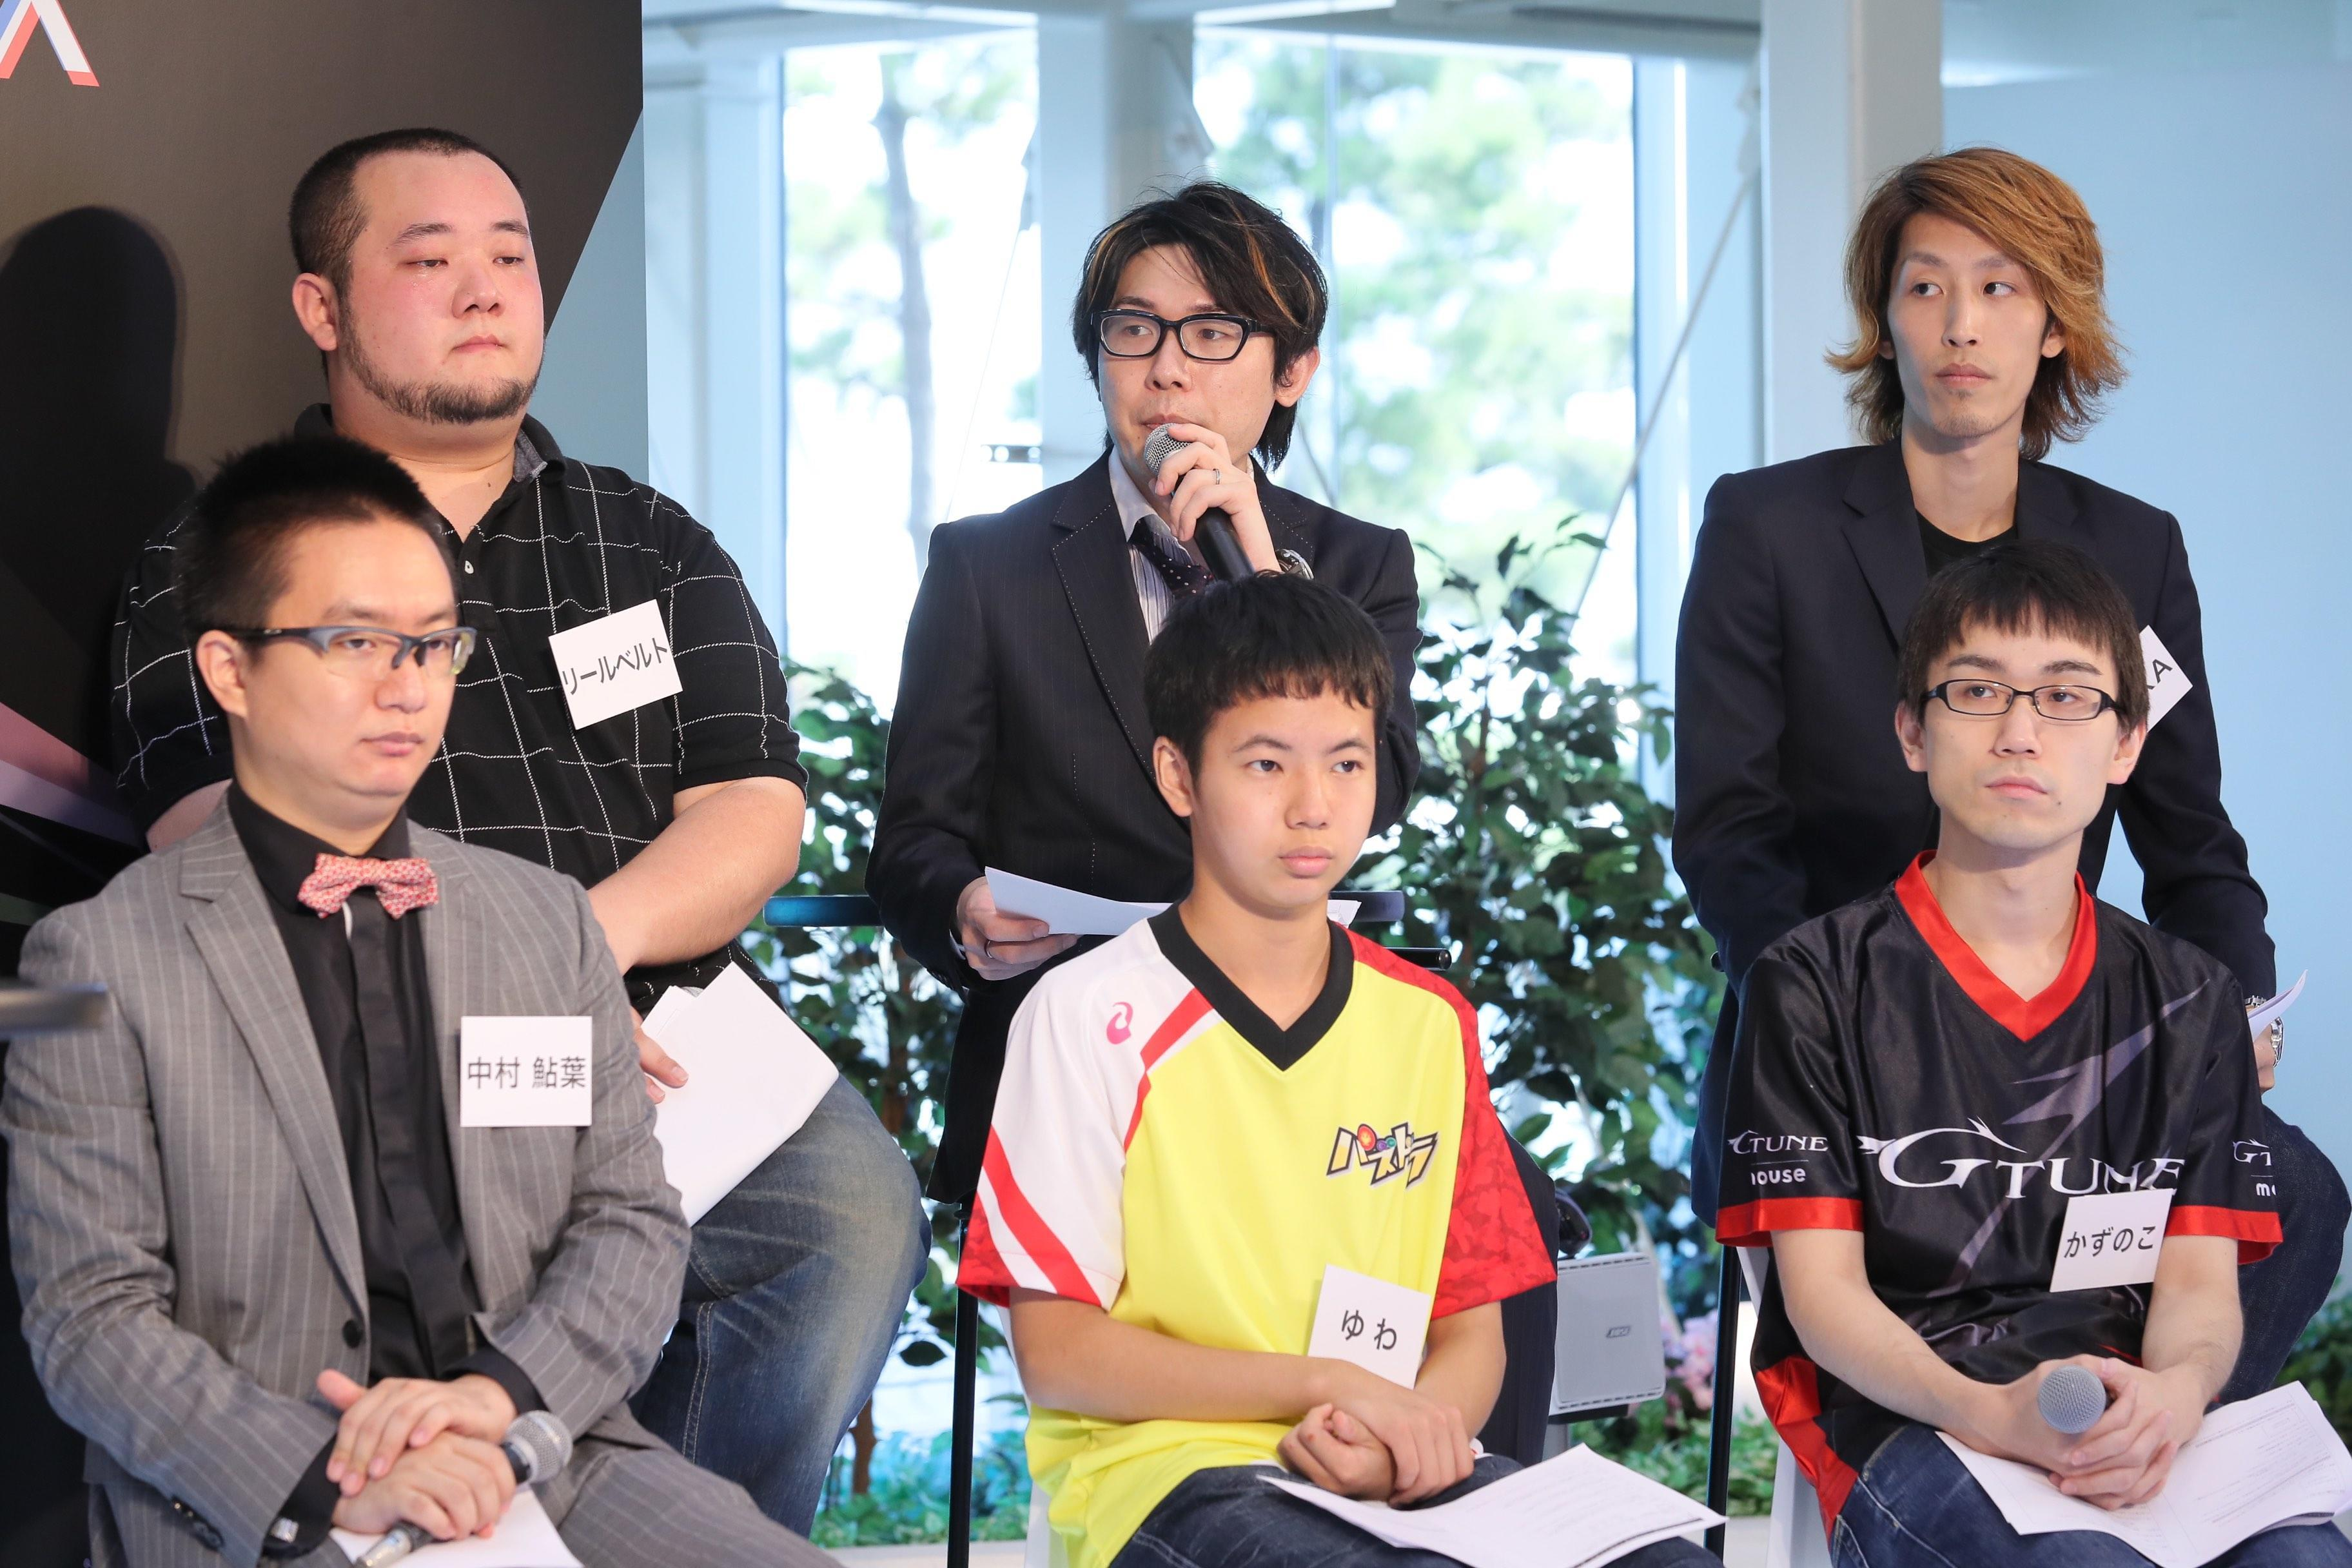 http://news.yoshimoto.co.jp/20180925043701-1d65ec7dd45fd541af81ba4c836752e79d42a709.jpg